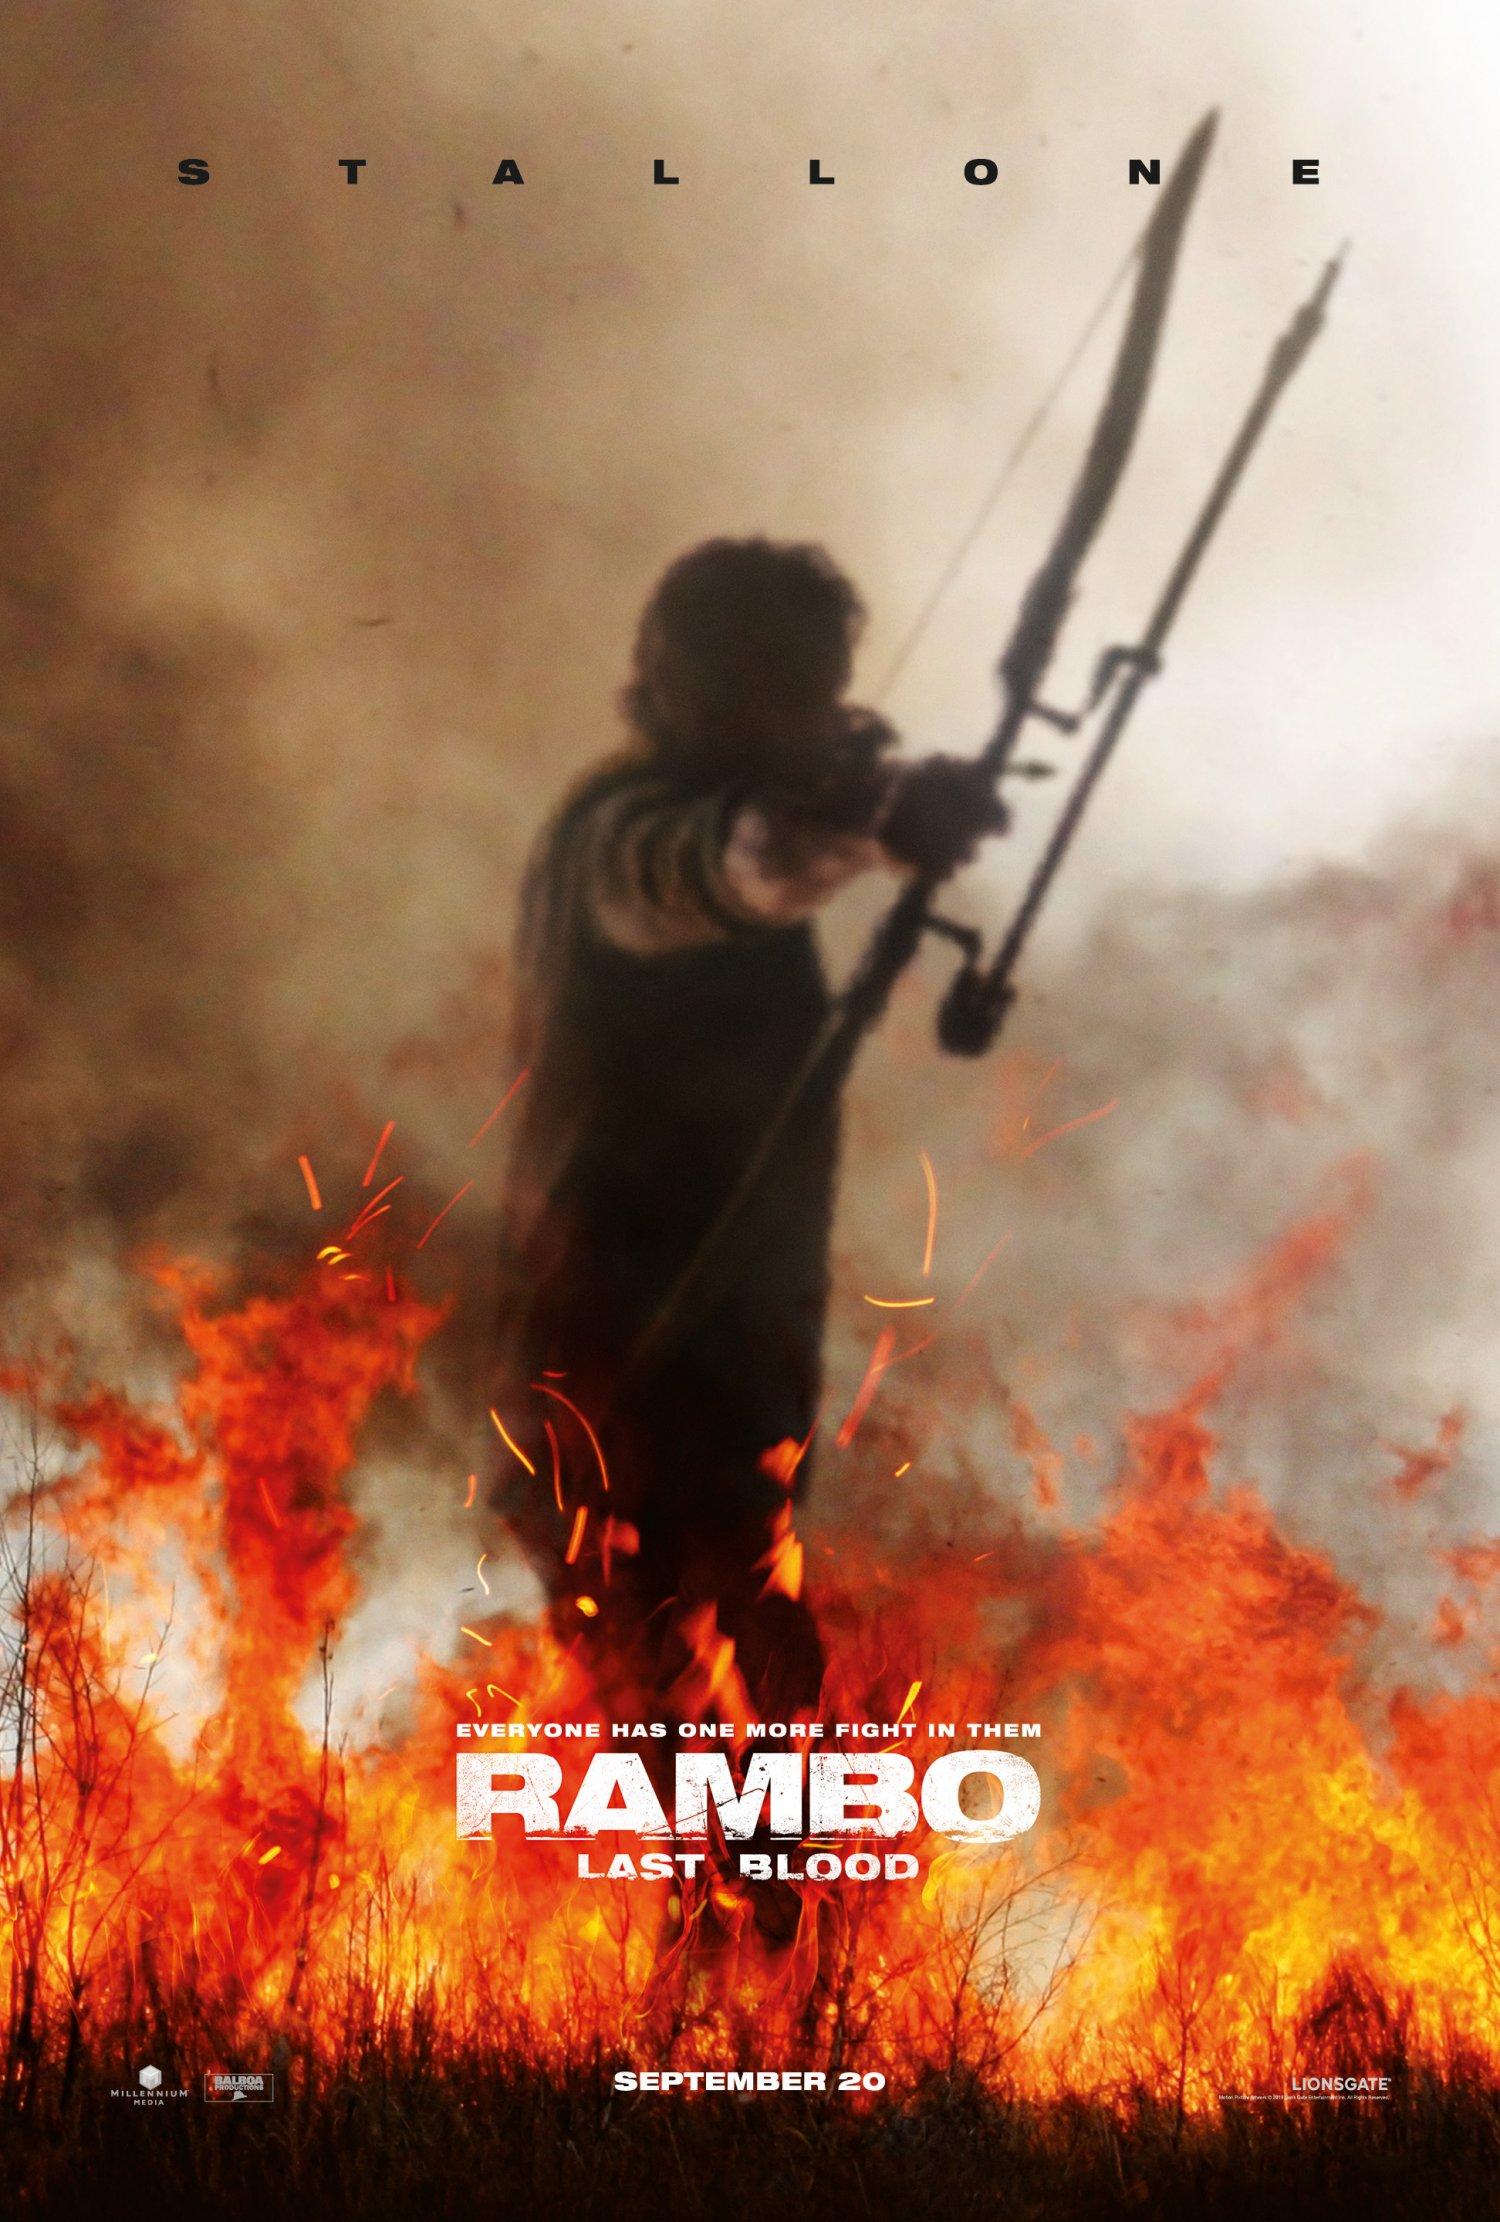 10840_Rambo_1Sheet_Teaser_Fire_FM_LRrgb